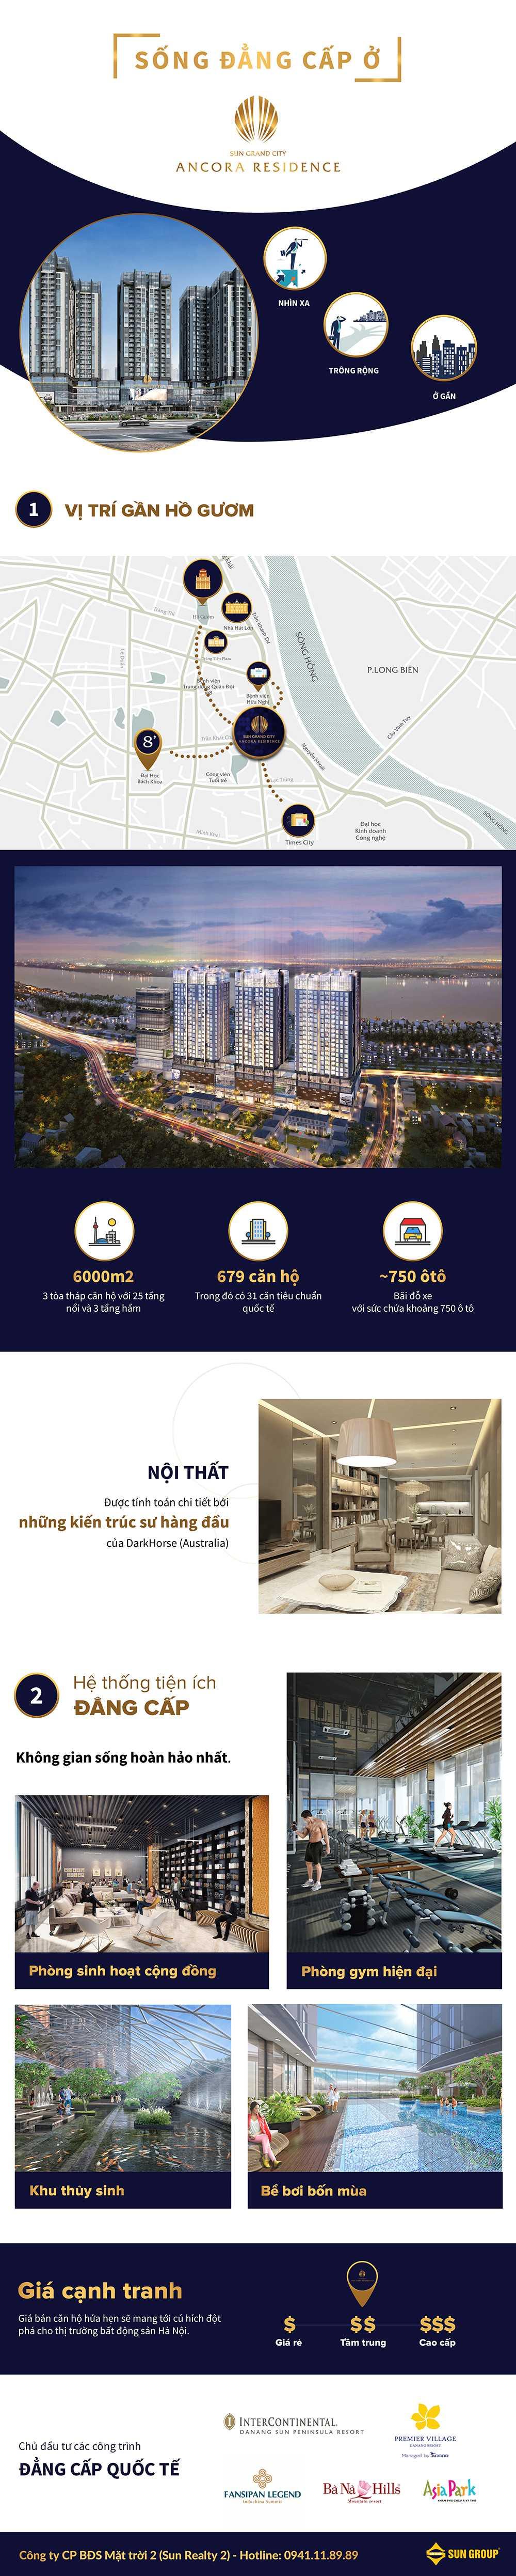 Sun Grand City Ancora Residence: Kiet tac an cu ben Ho Guom hinh anh 1